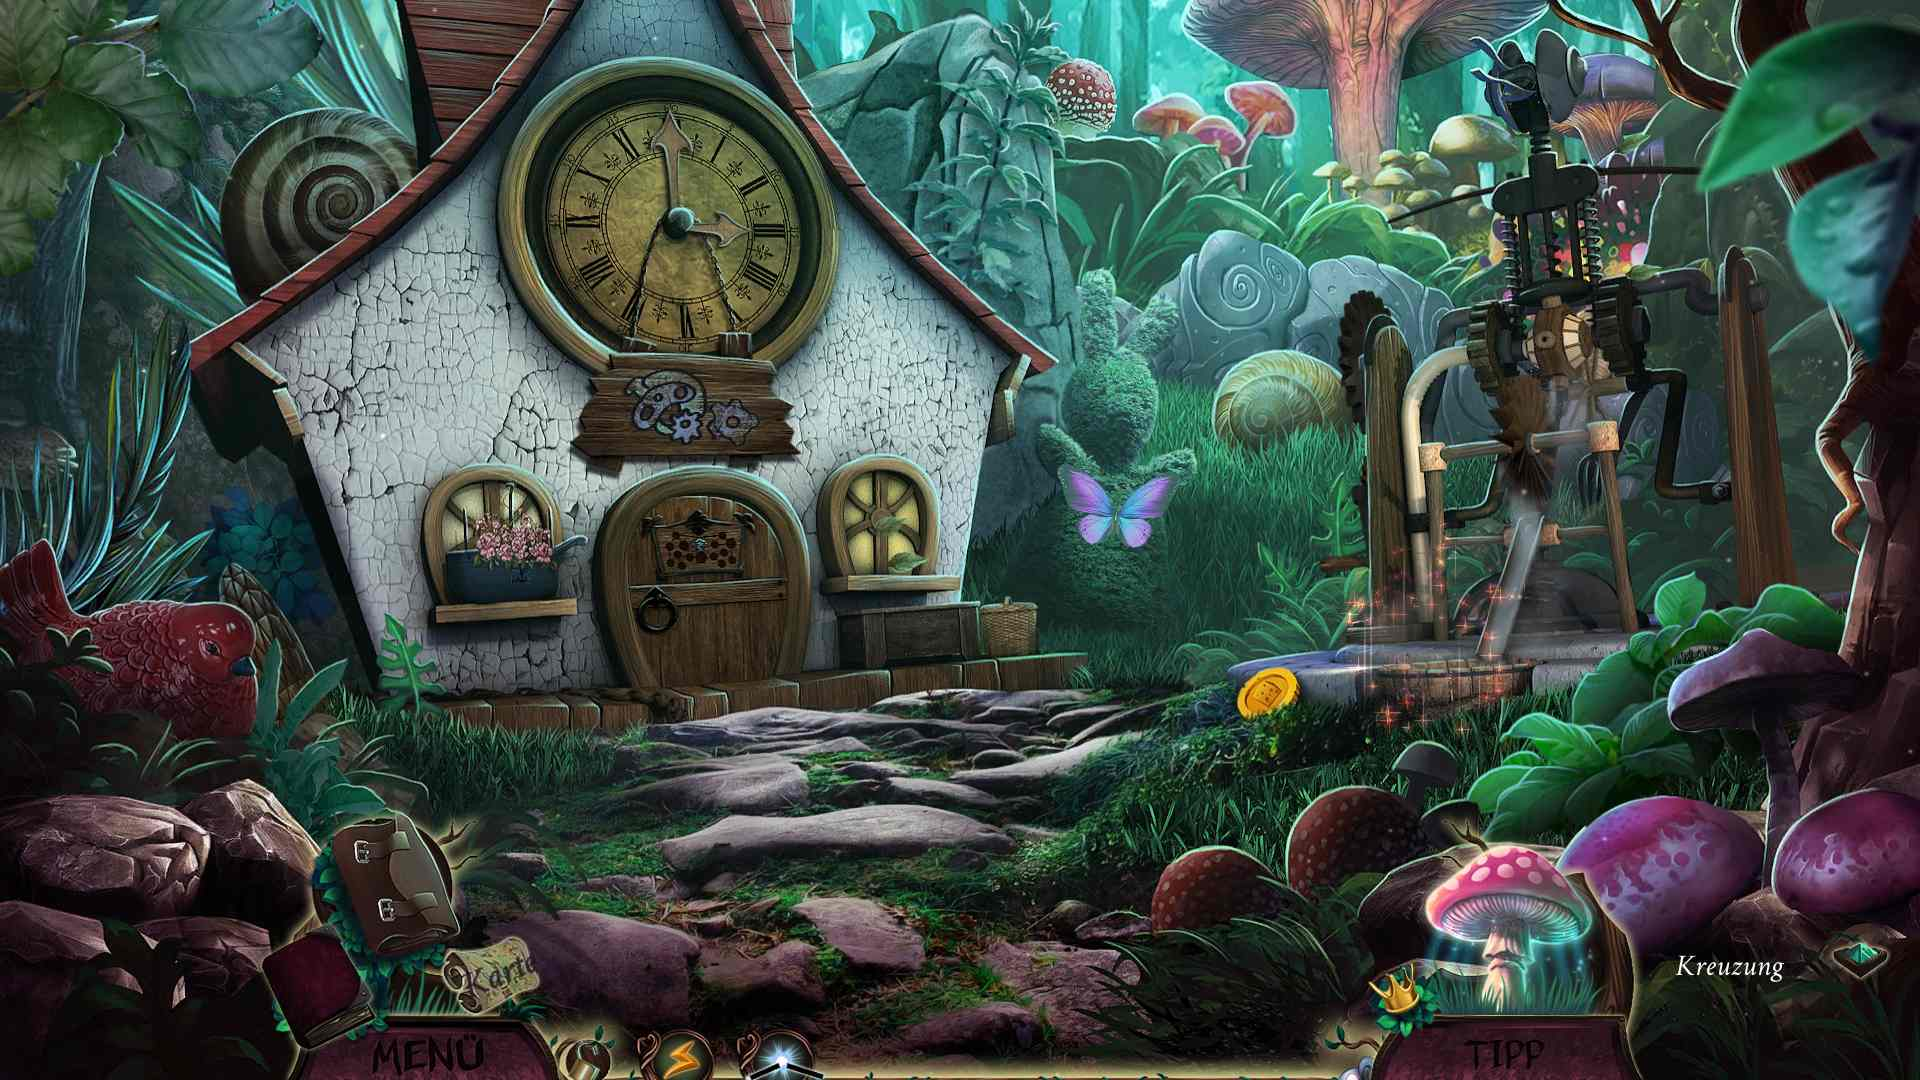 tiny tales herz des waldes wimmelbild screen04. Black Bedroom Furniture Sets. Home Design Ideas